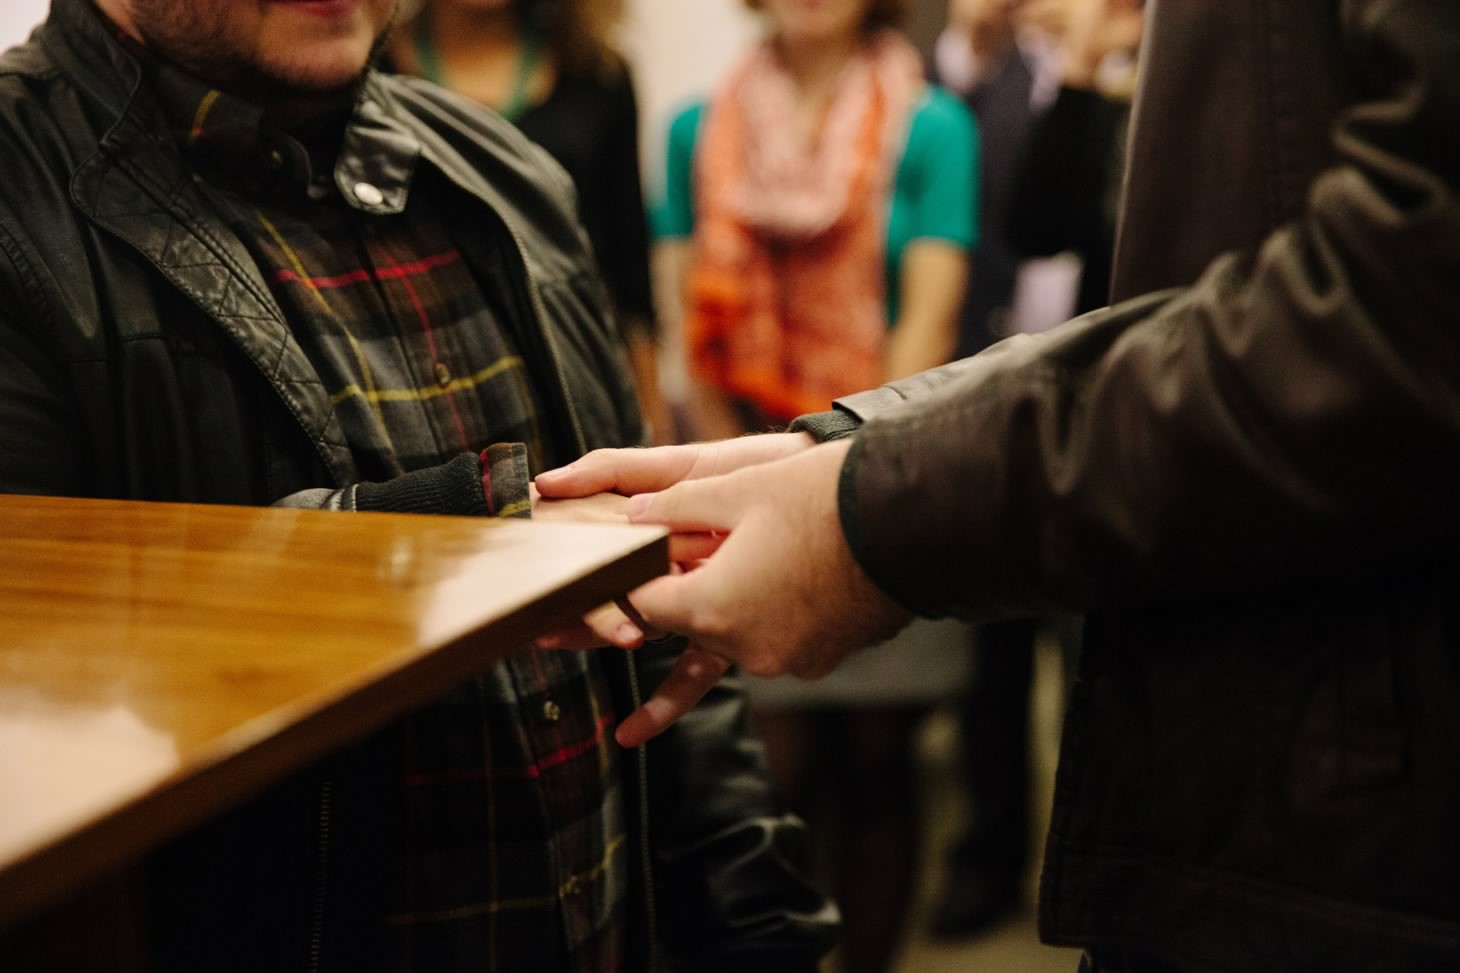 028-nyc-wedding-elopement-lgbt-friendly-photographer-city-hall-kareoke.jpg